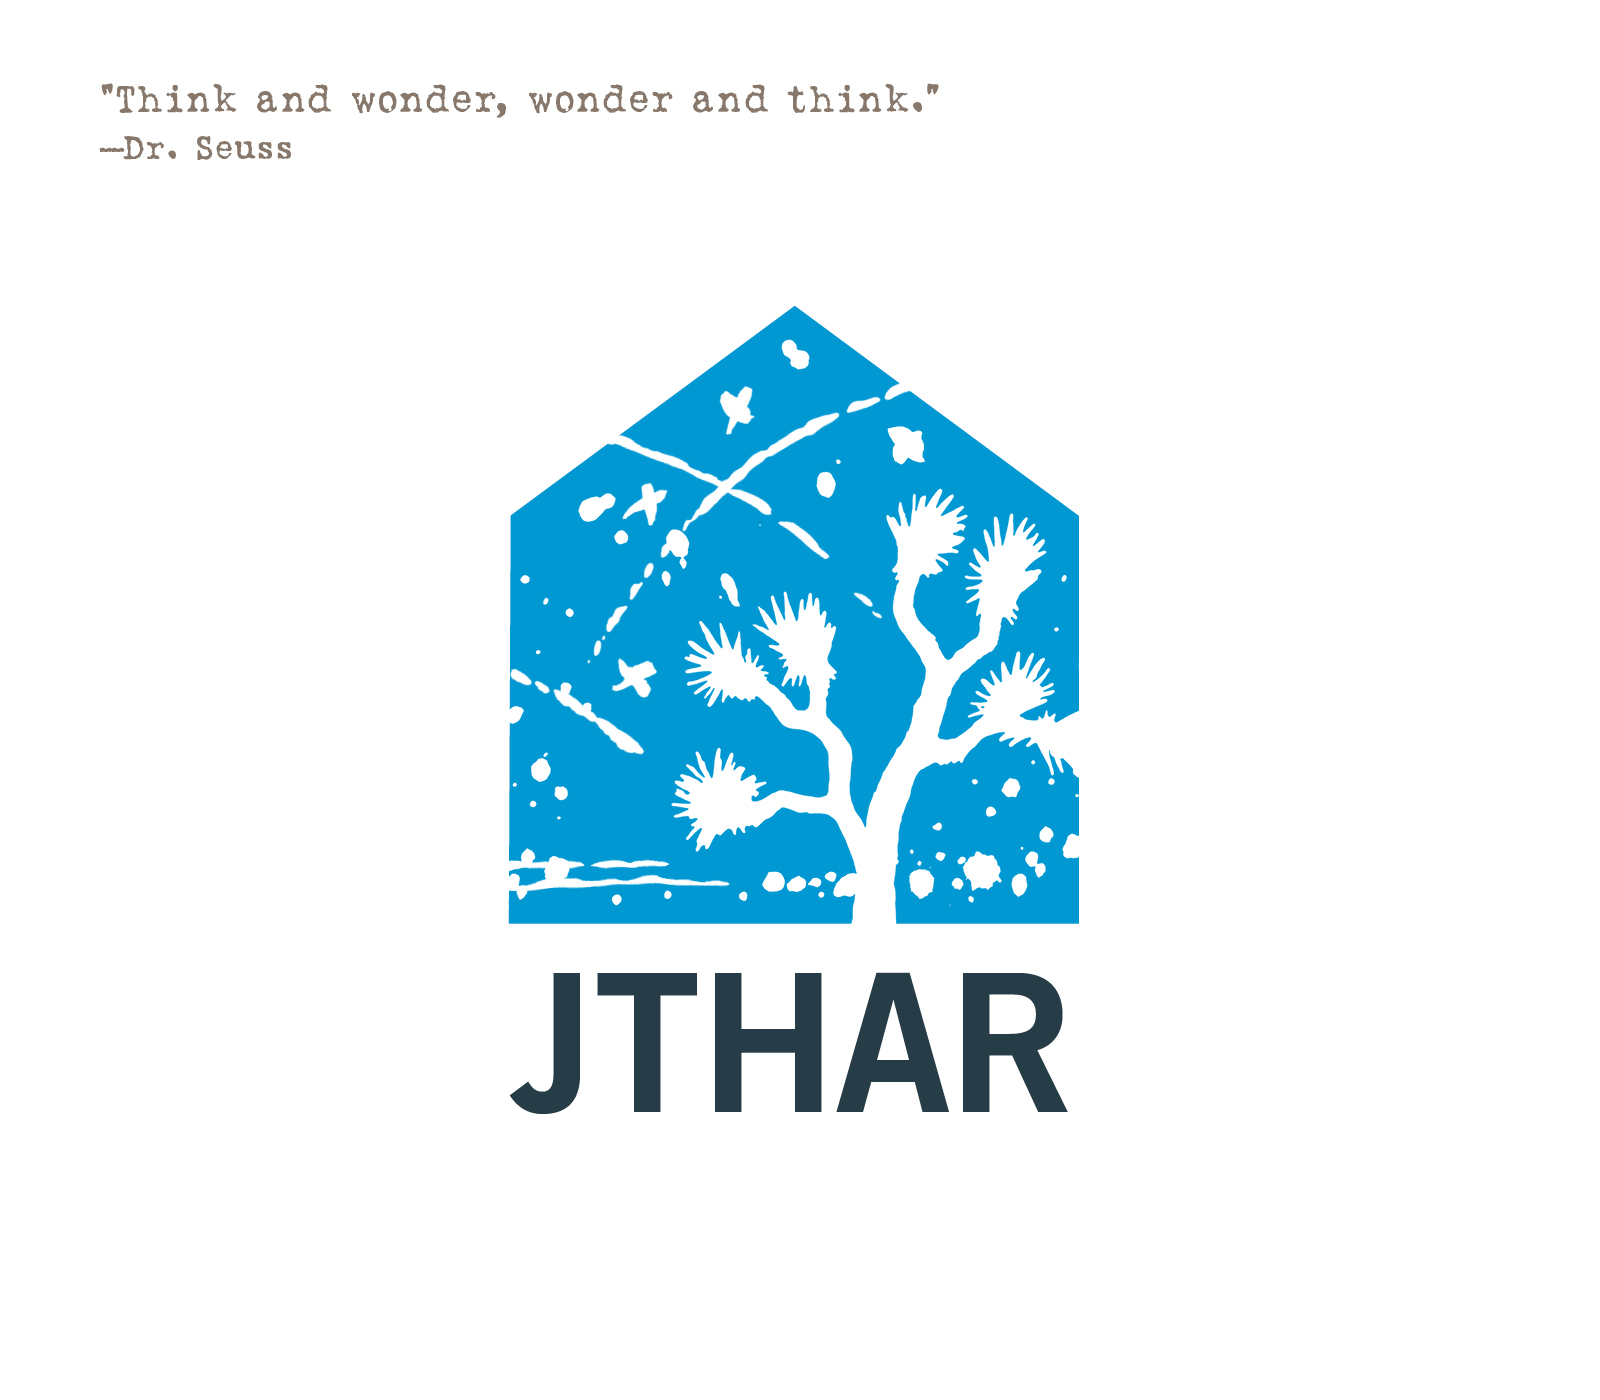 JoshuaTree_Logo_Ideas_kickspark_blog18x3.jpg